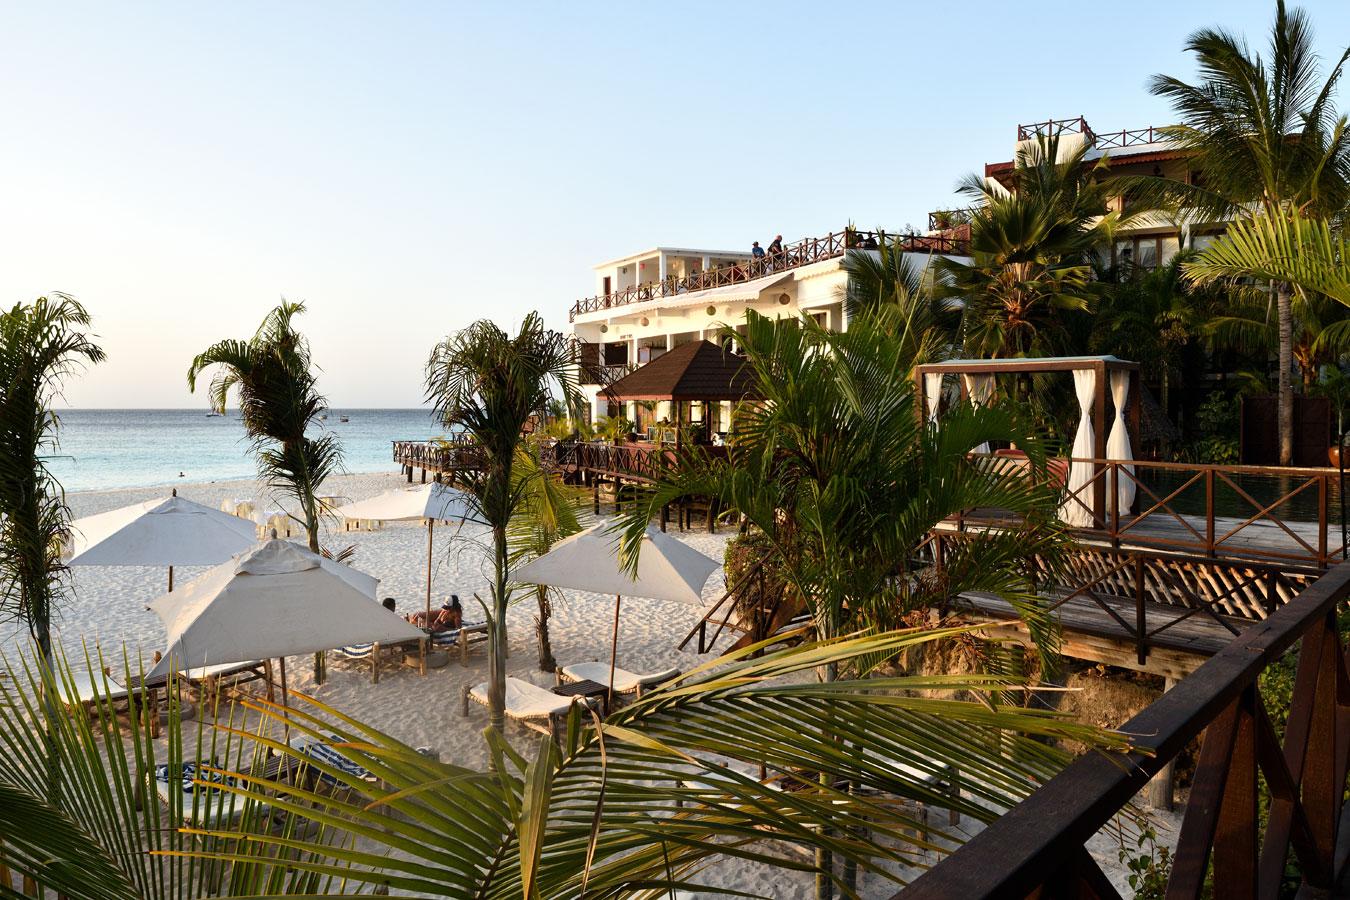 The Z hotel is the original boutique hotel on Zanzibar